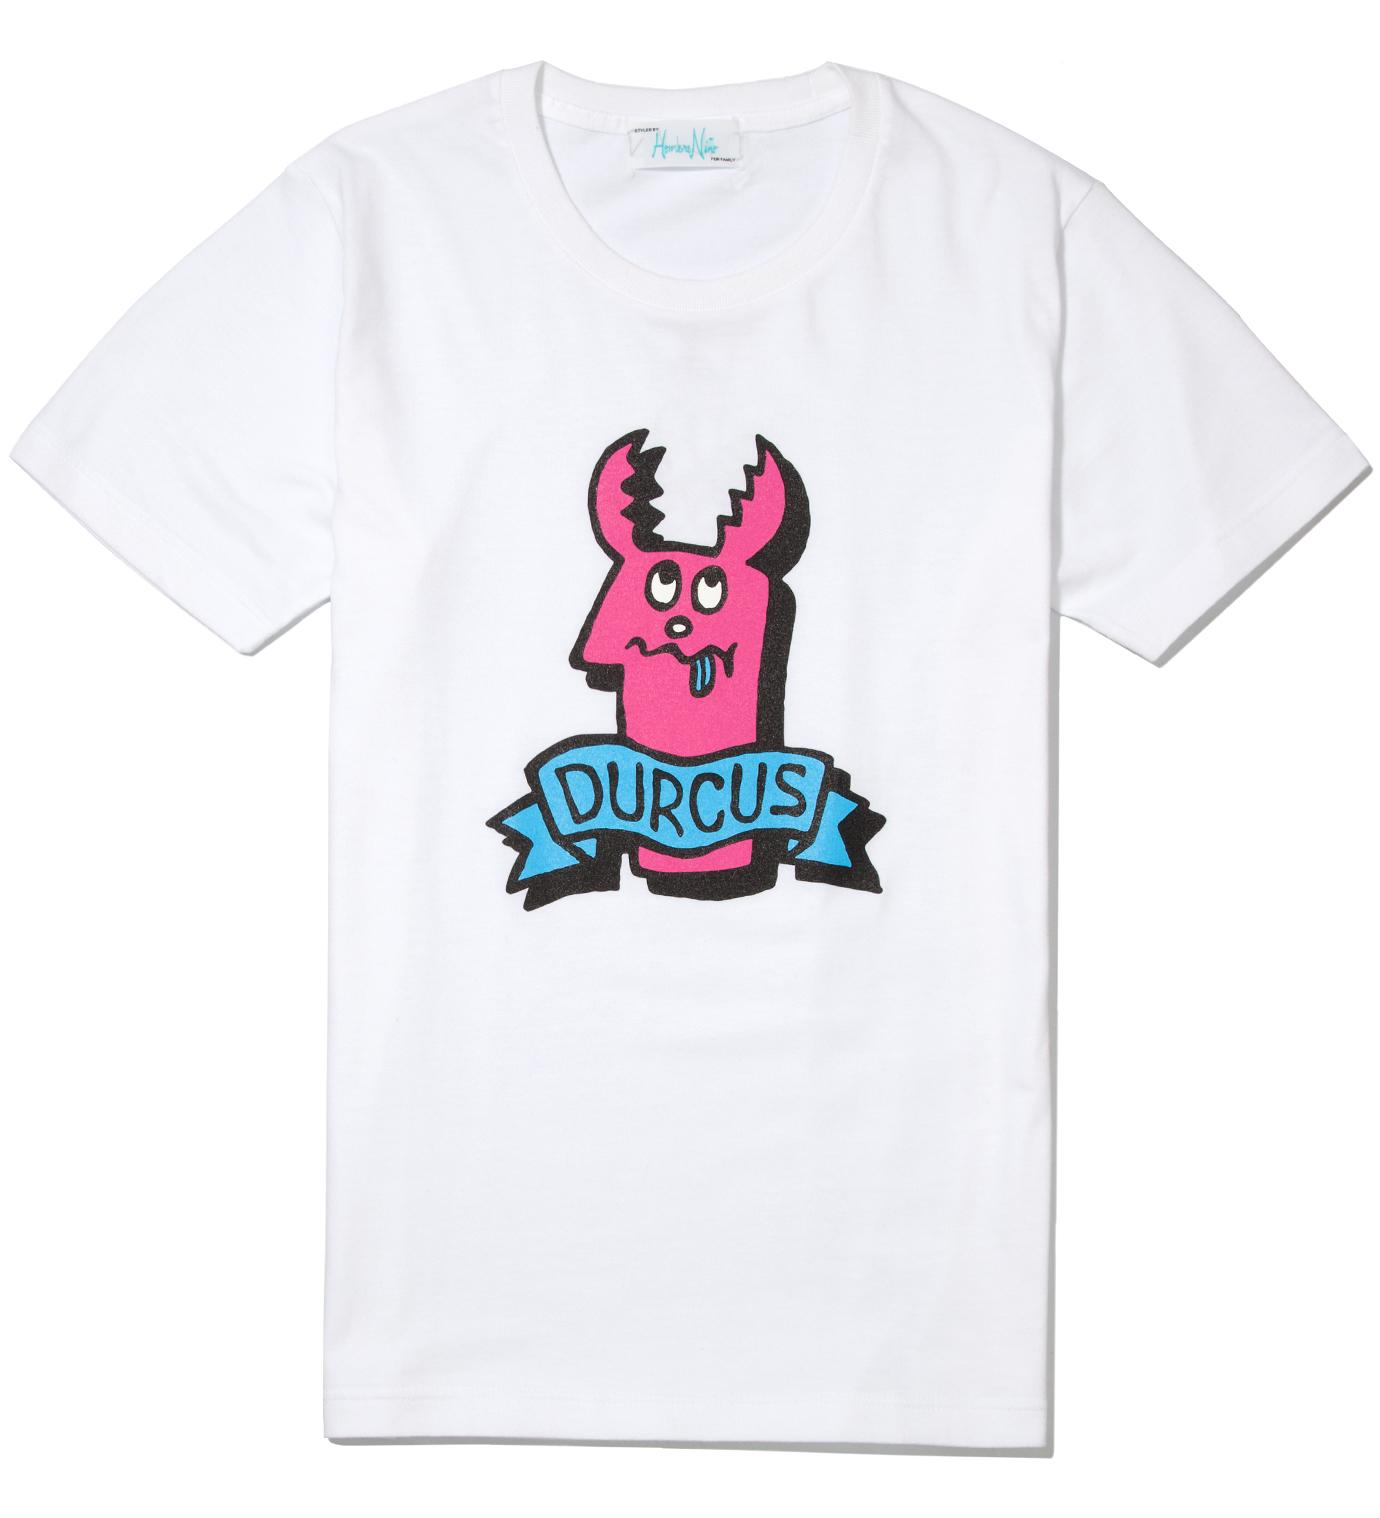 Hombre Nino White Durcus T-Shirt